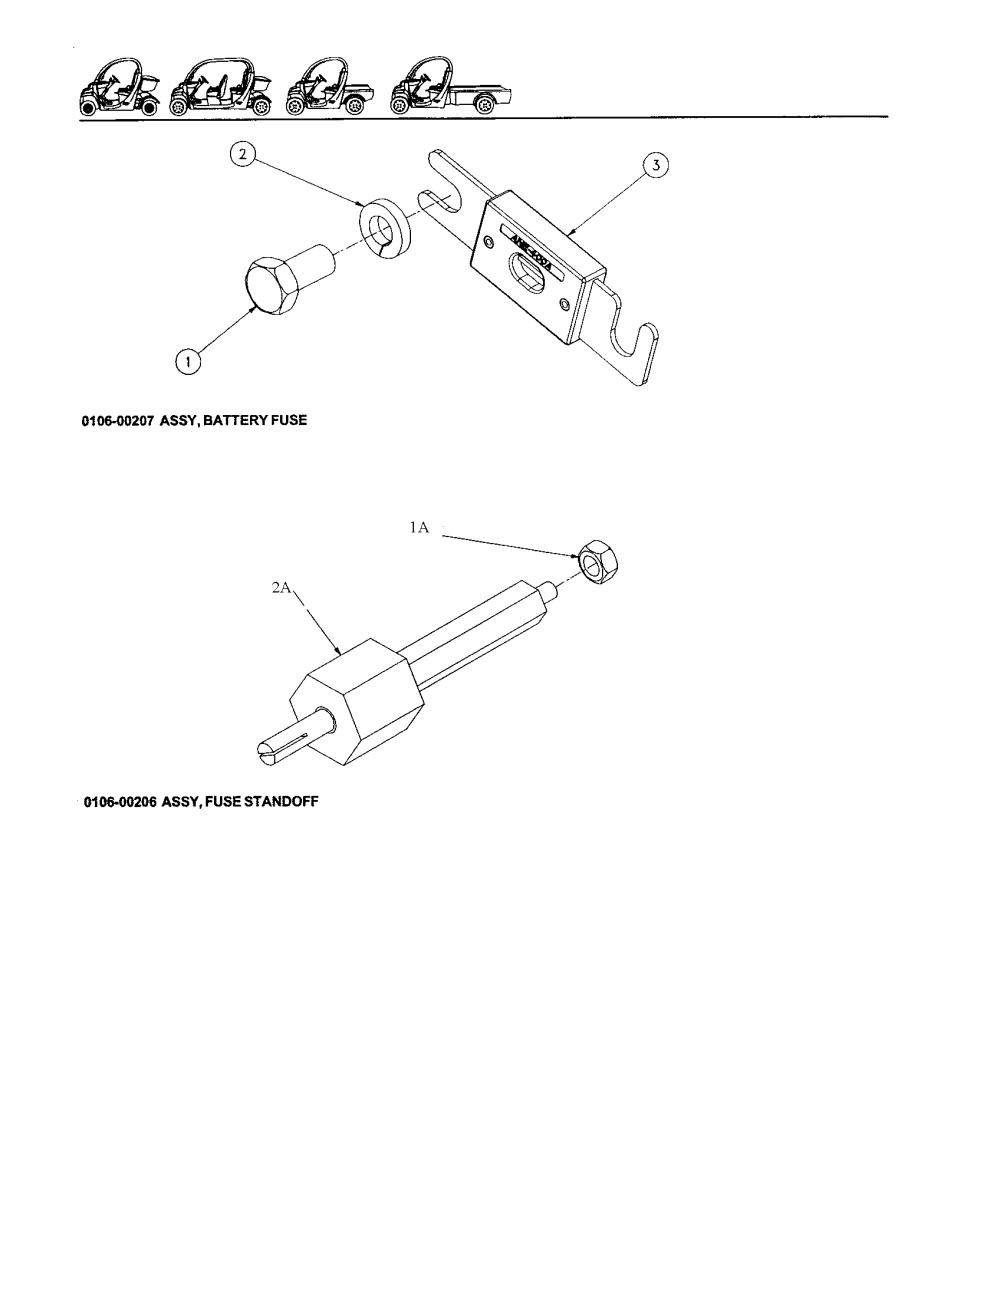 medium resolution of gem products motorcars batter fuse fuse standoff parts